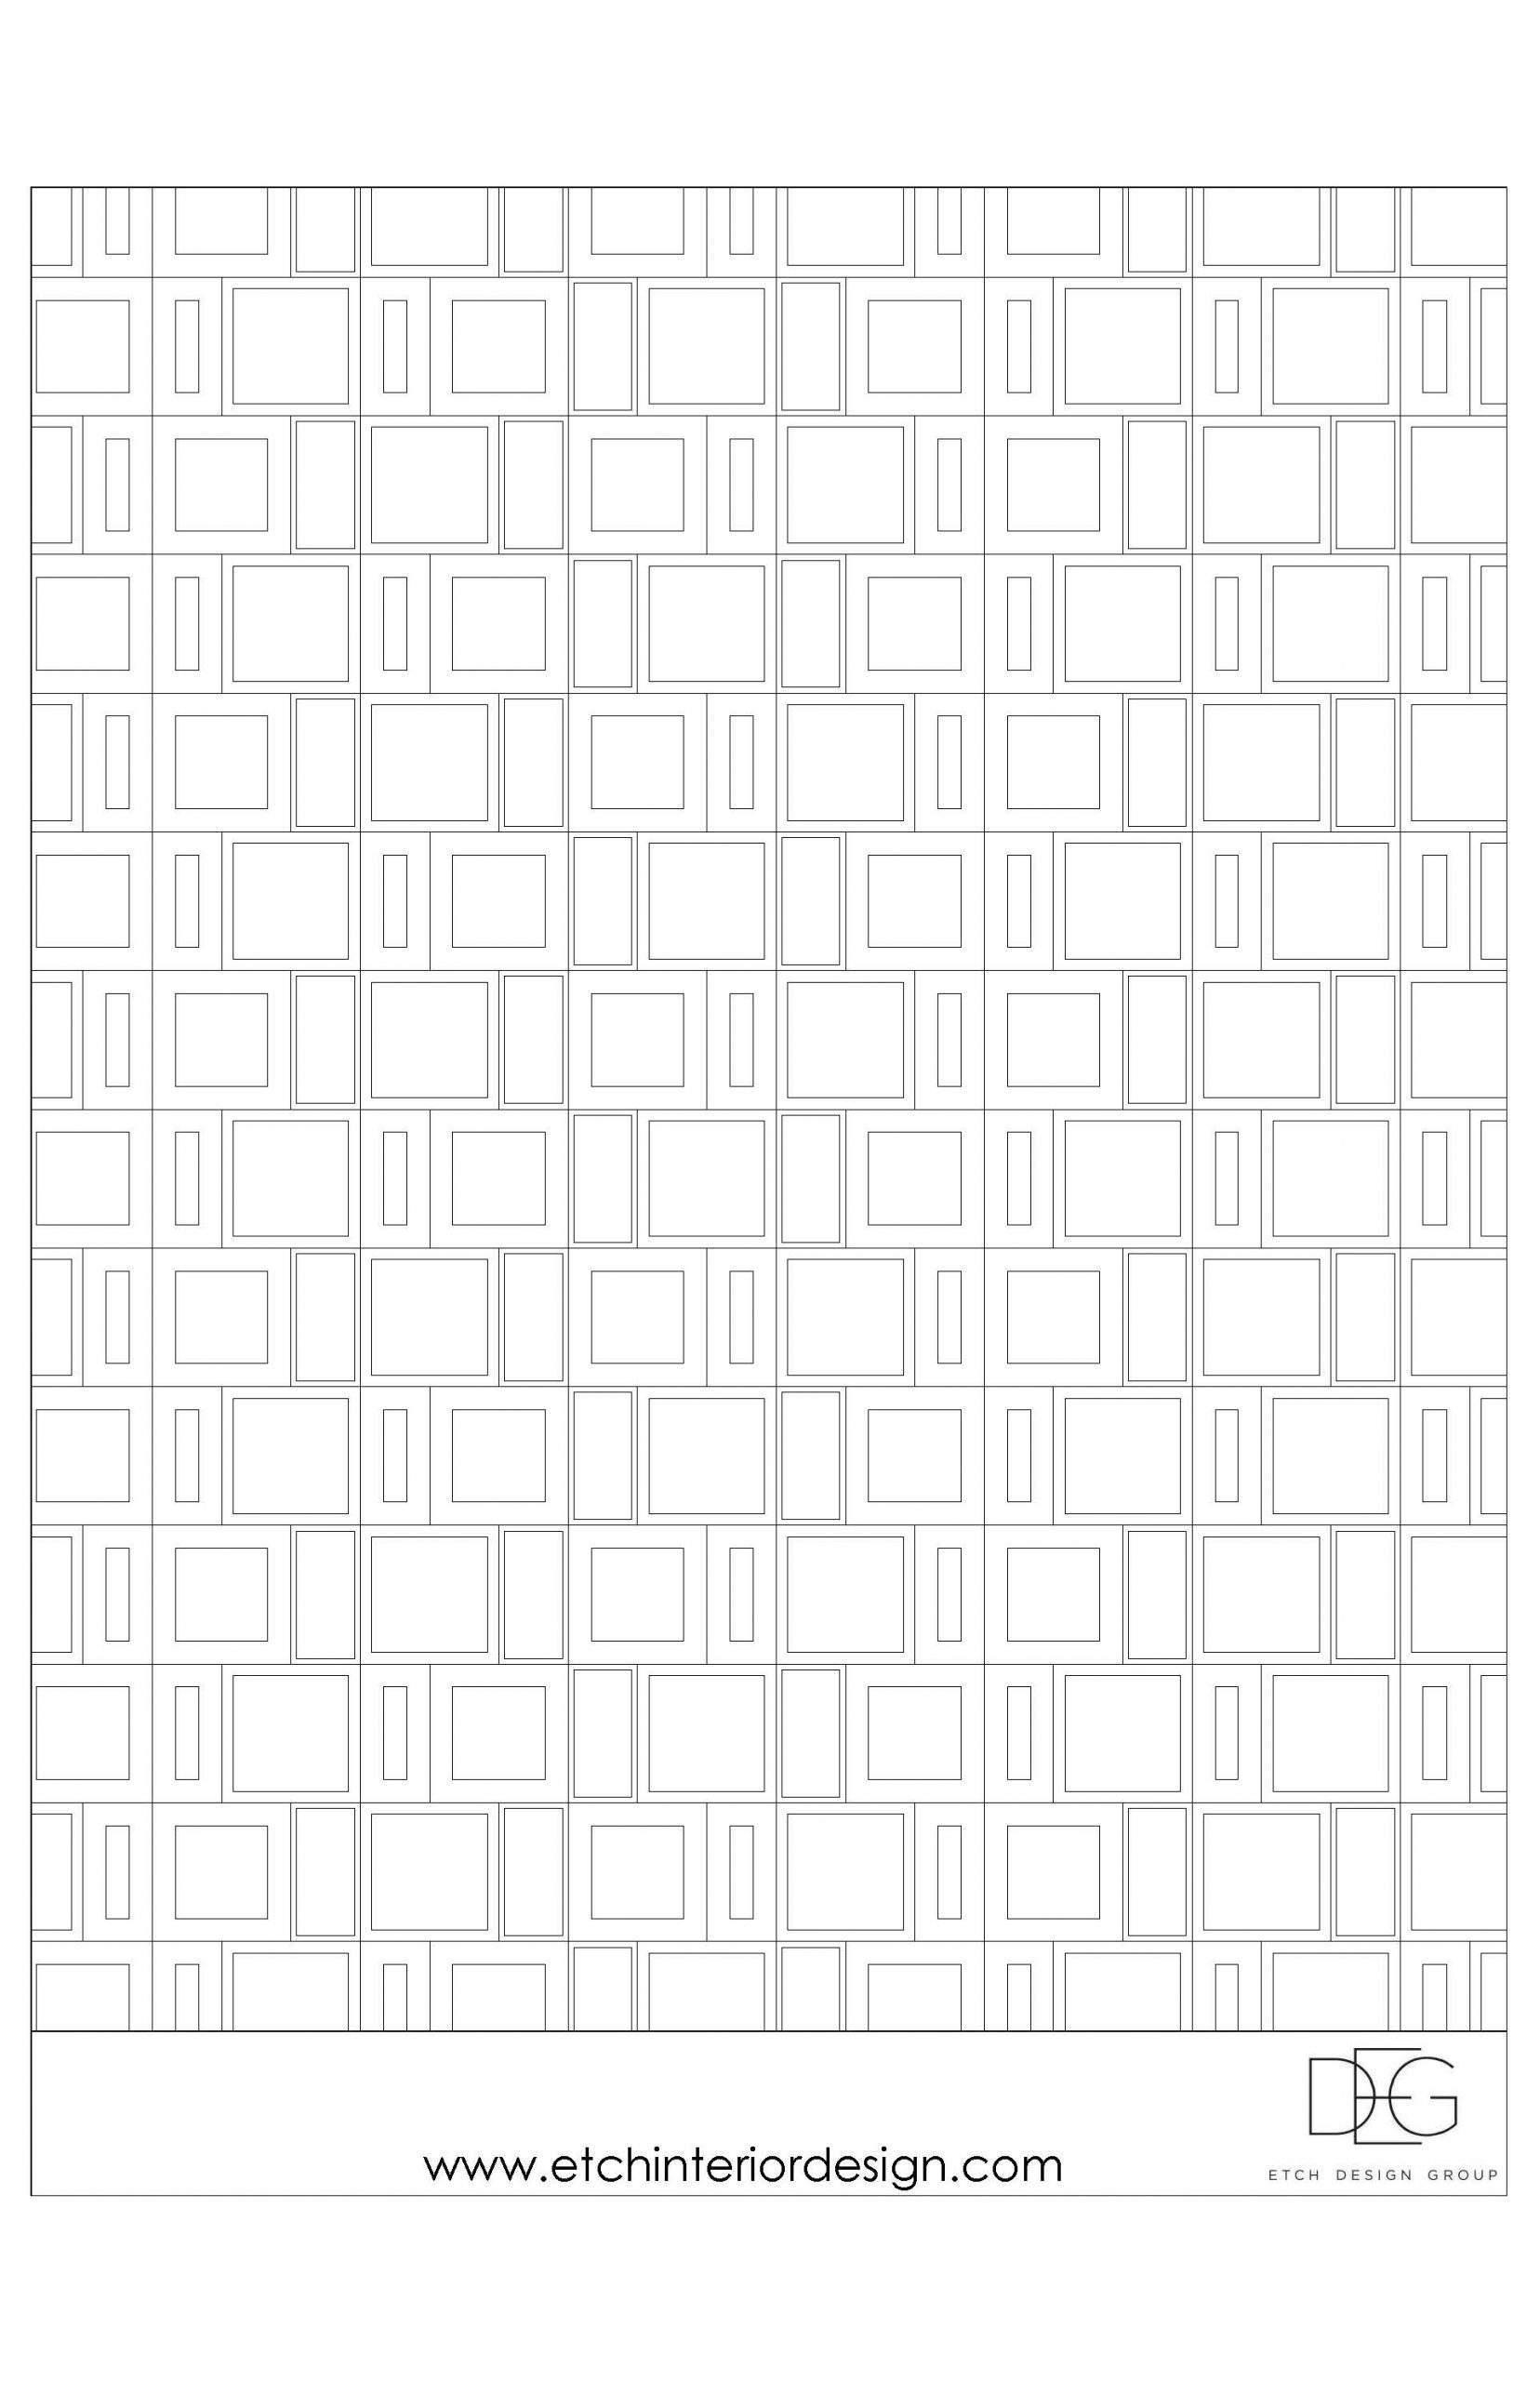 ETCH INTERIOR DESIGN AUSTIN TEXAS COLORING PAGE COVID 19